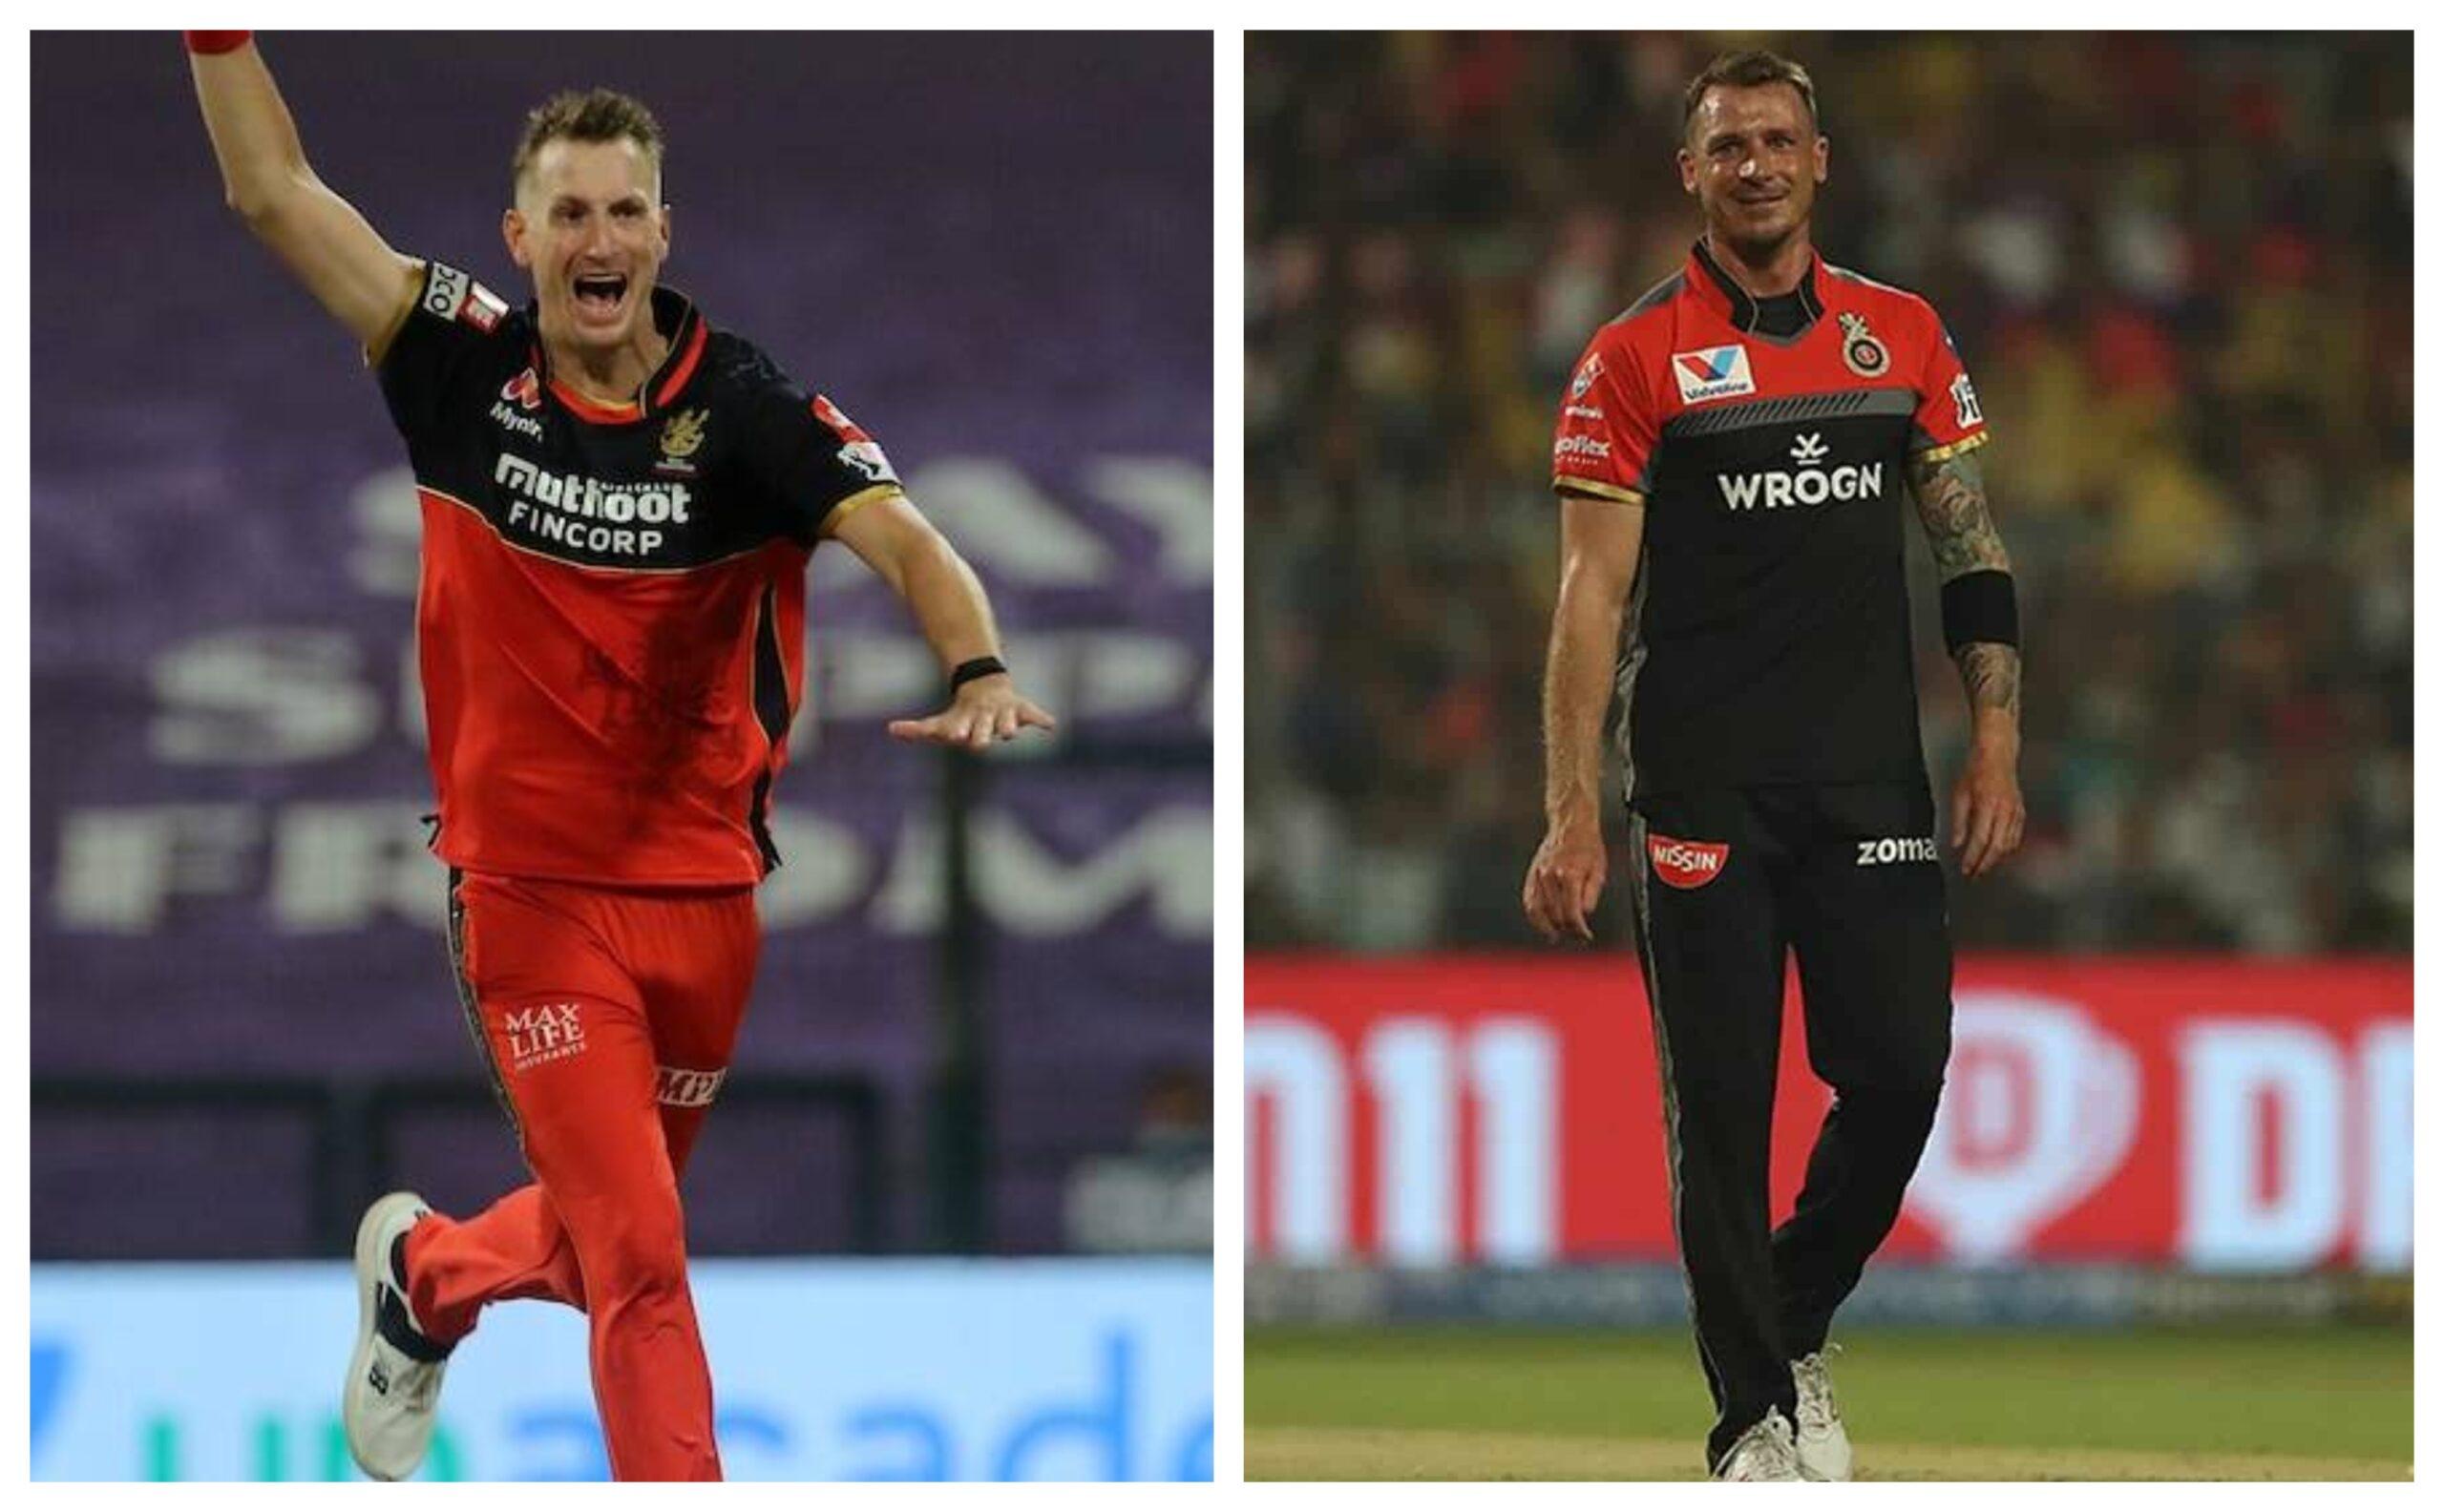 Chris Morris and Dale Steyn | IPL/BCCI